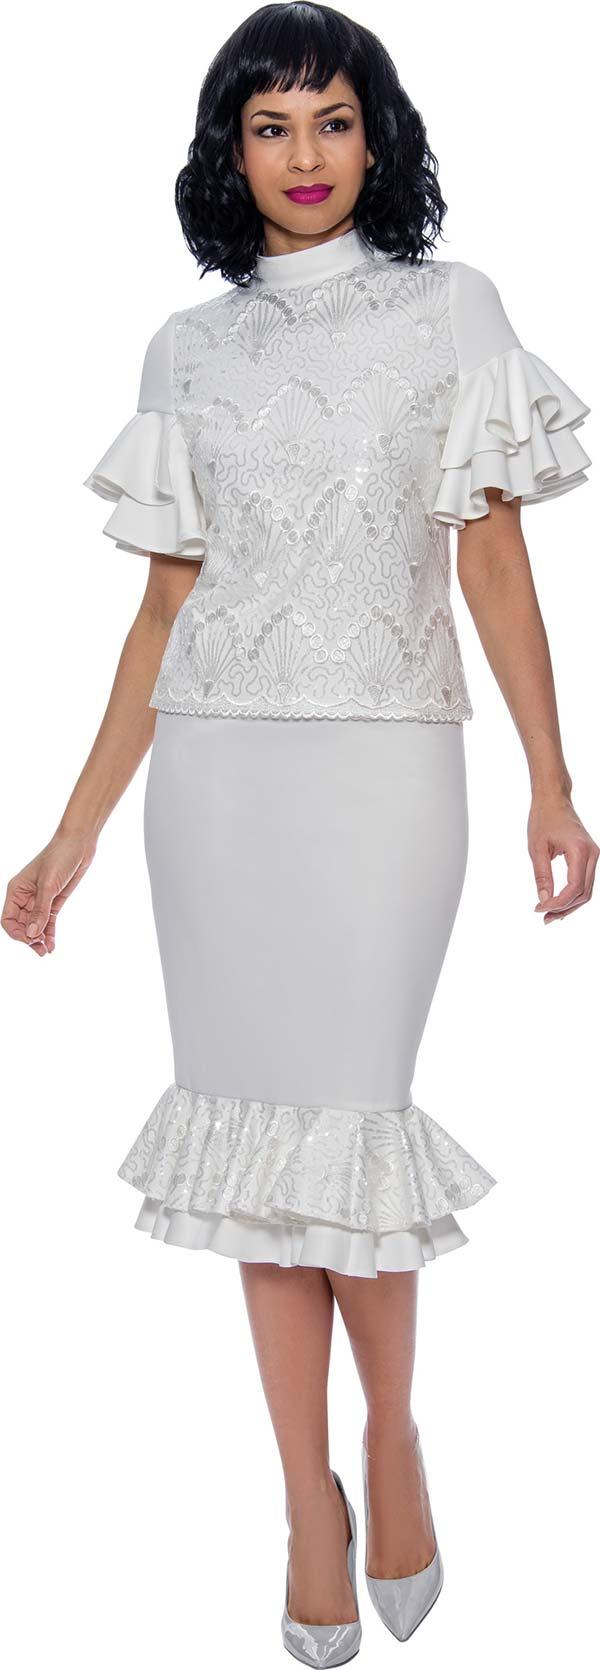 Terramina 7907 - Womens Double Flounce Skirt Set With Tiered Ruffle Sleeve Mock Neck Top